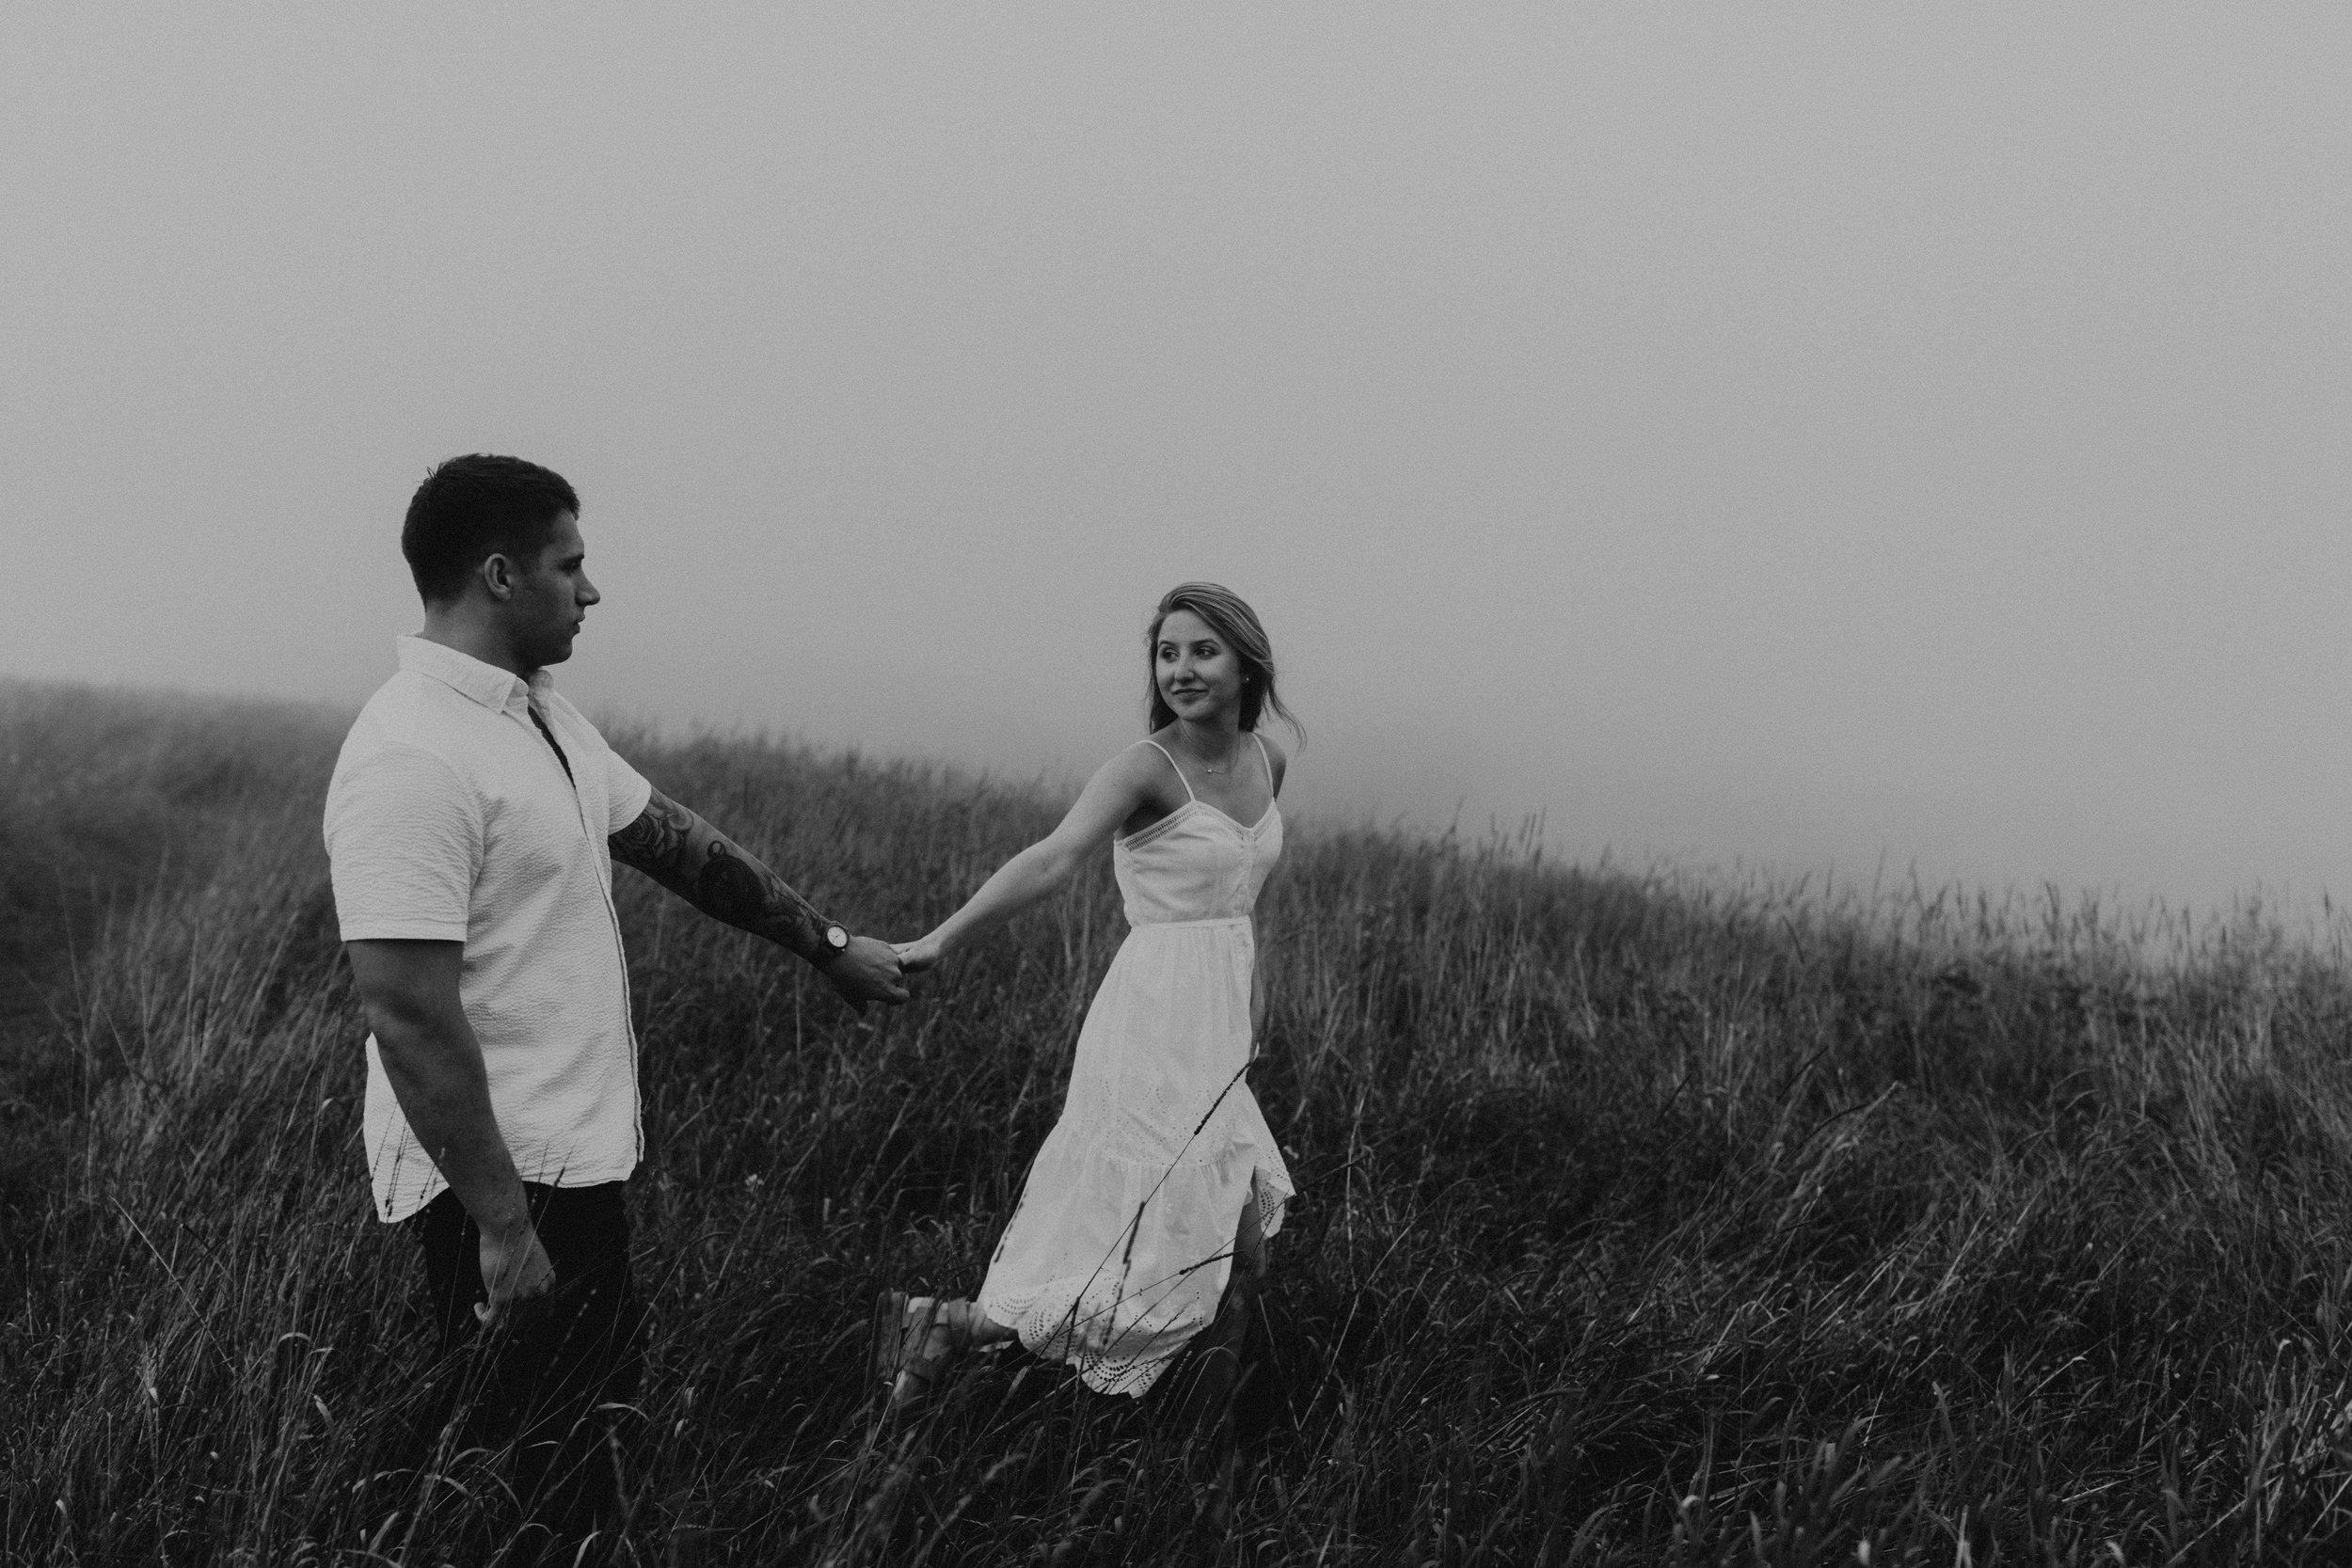 Finals_Madalynn Young Photography-1179.JPG